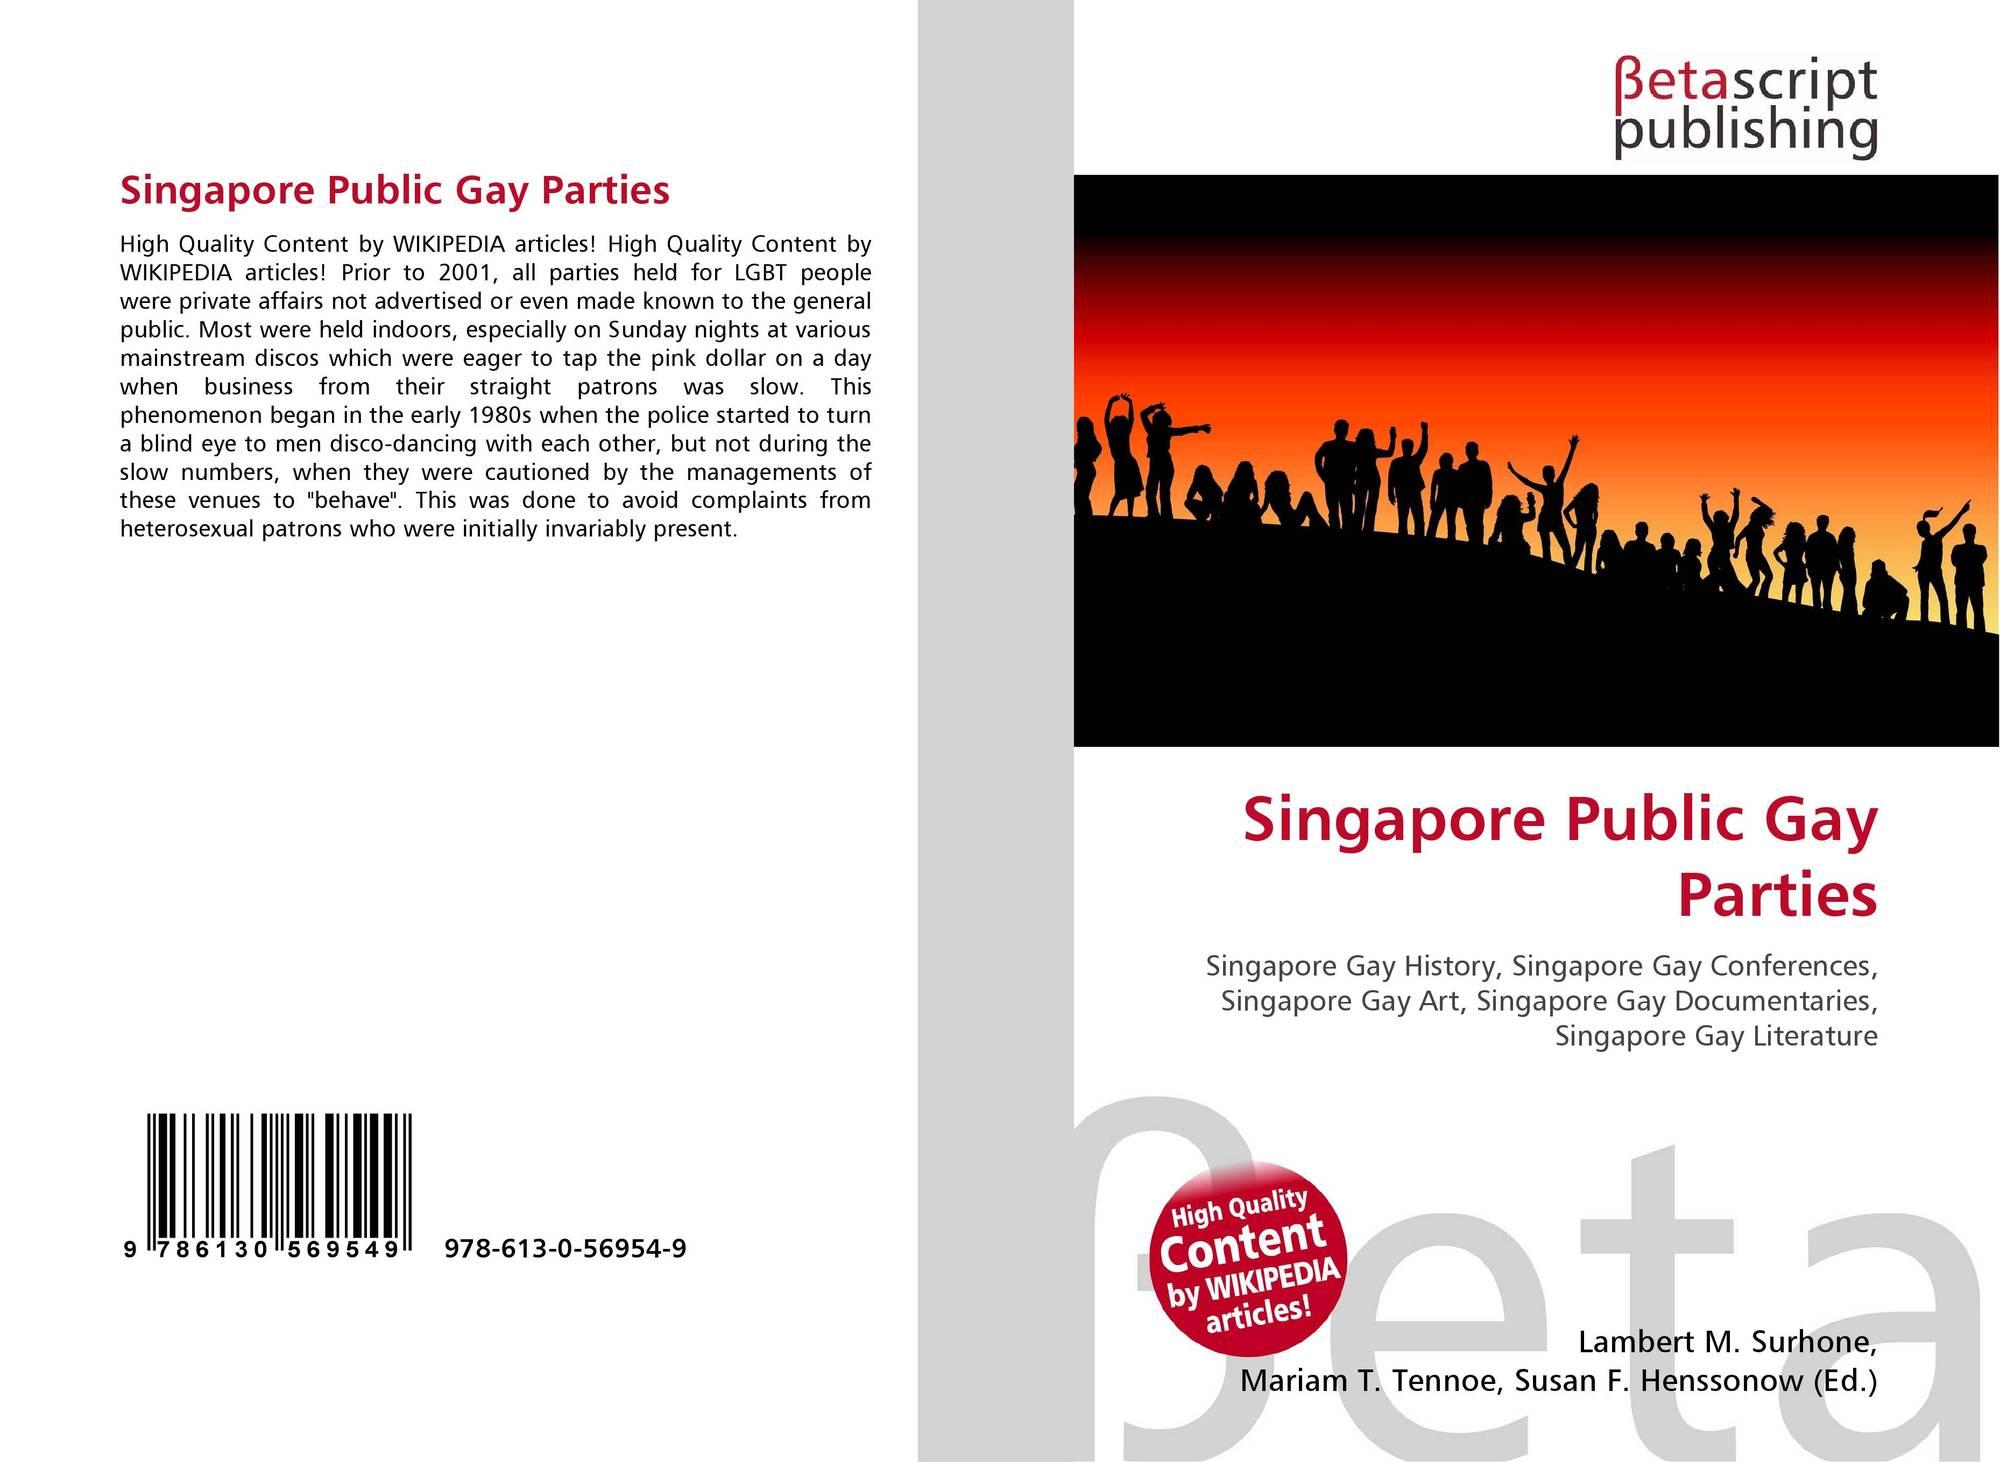 gay incontri online Singapore